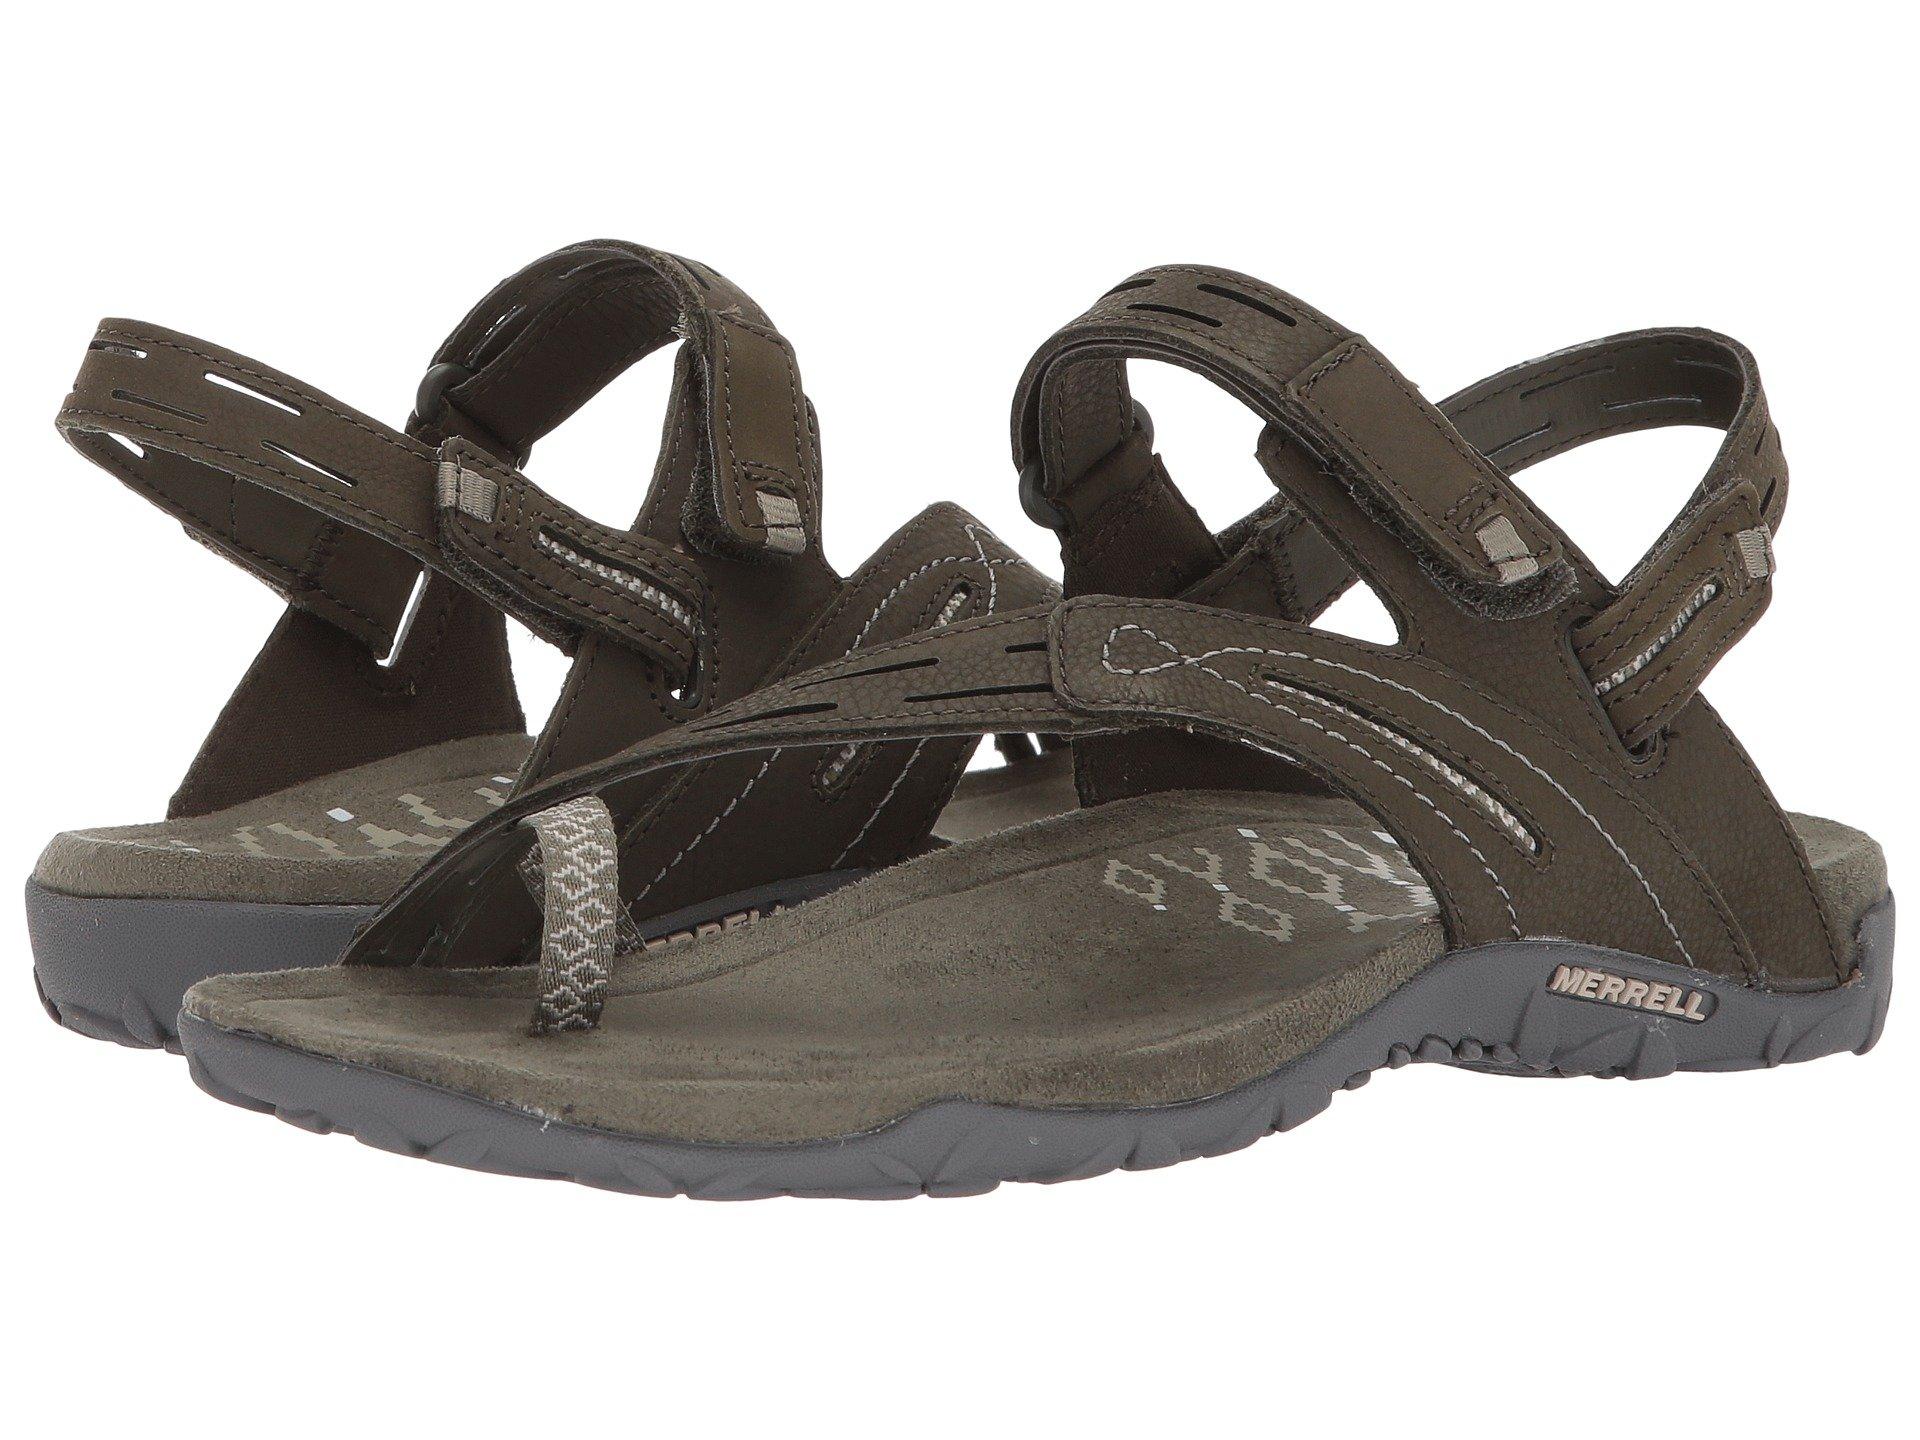 fbaca4688b4b Women s Merrell Sandals + FREE SHIPPING